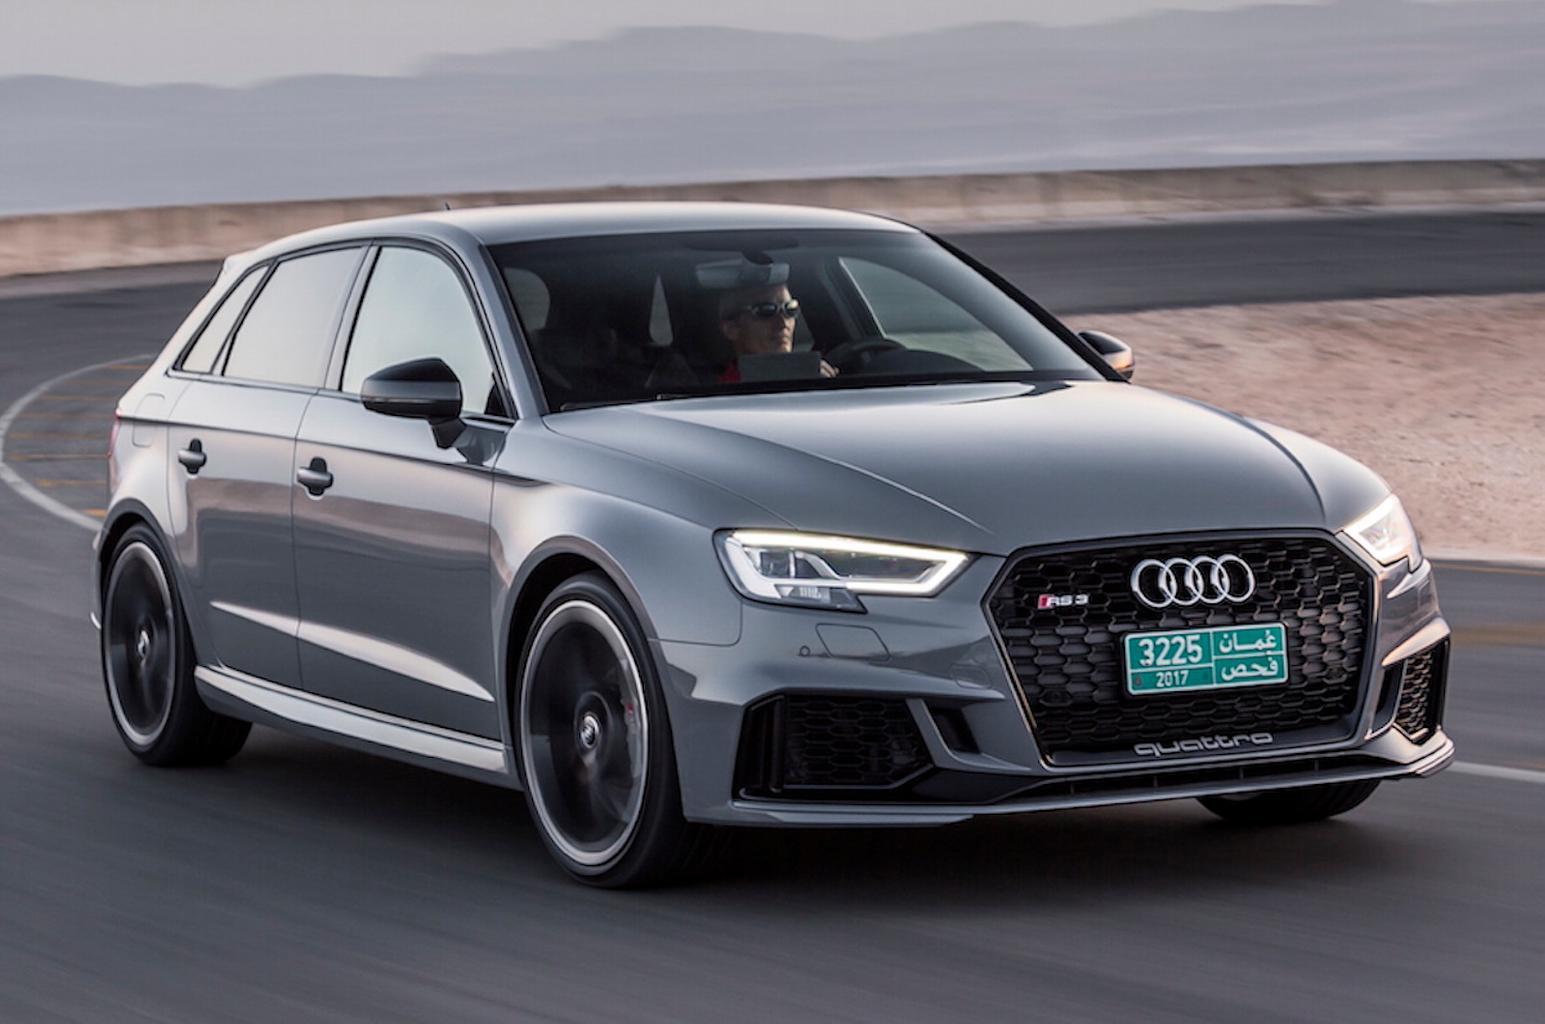 Audi RS3 Sportback 2017 review verdict and specs